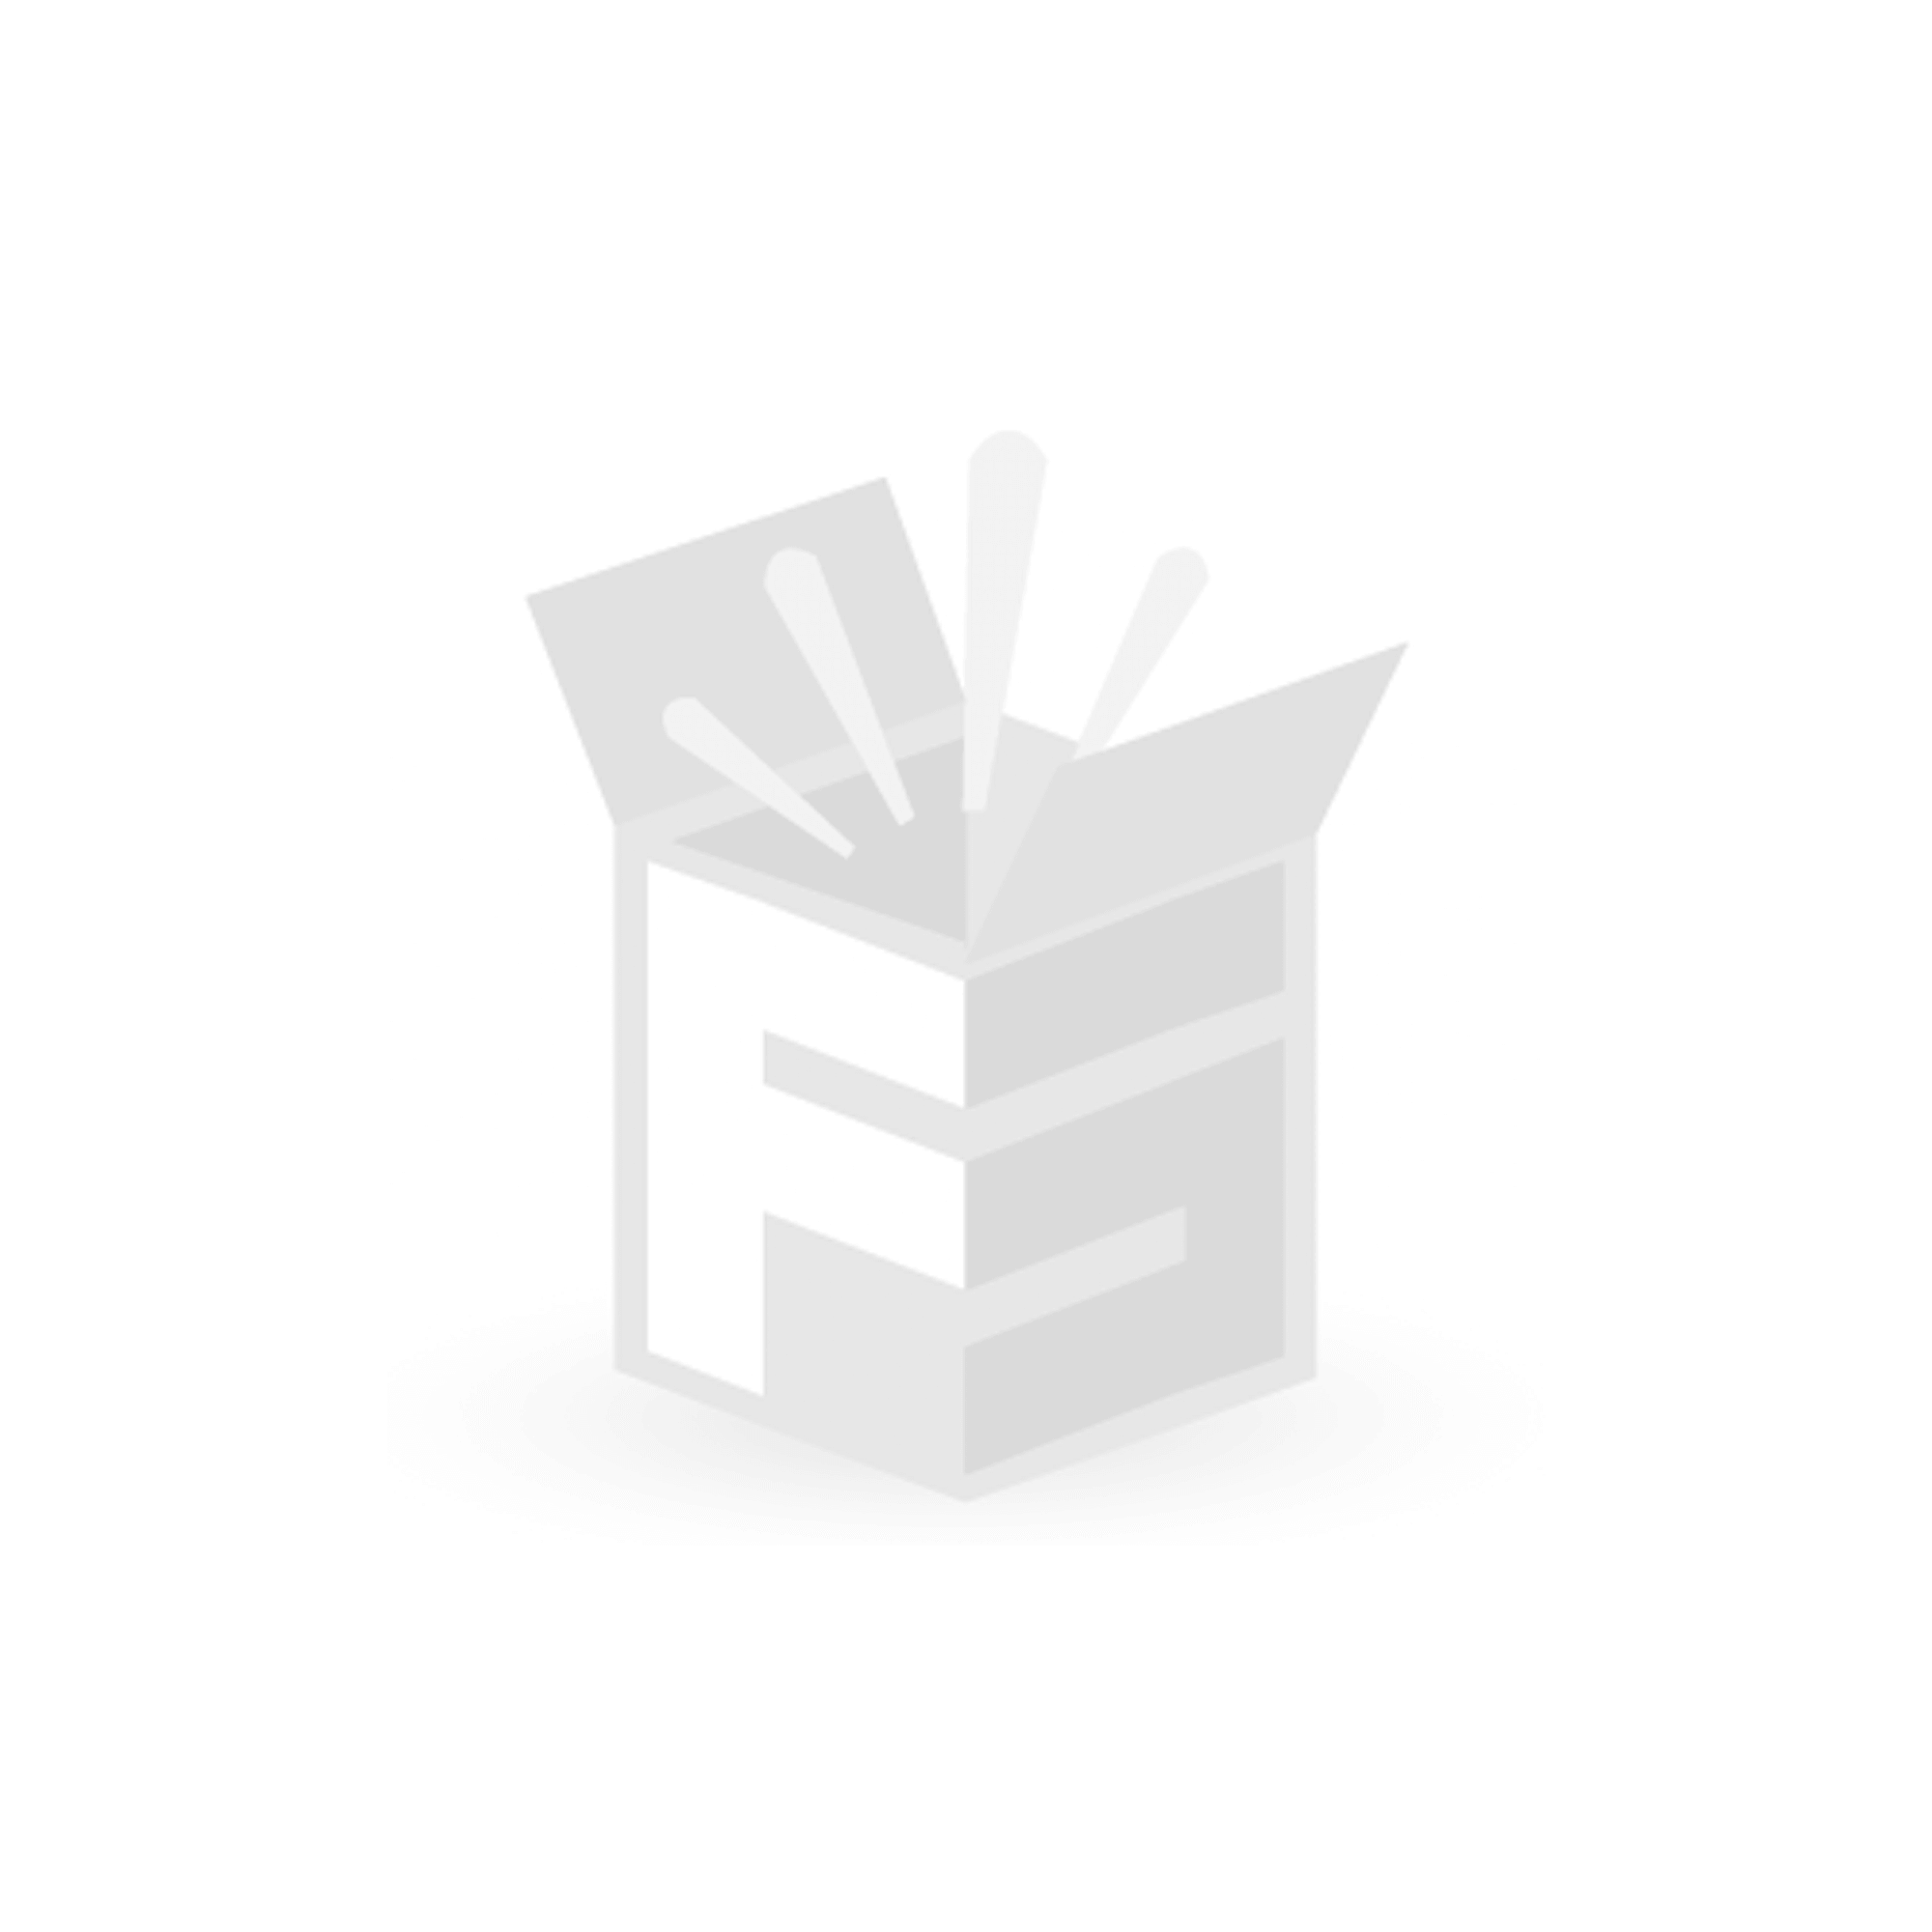 Tefal Pfannen-Set Selective TwinPack Ø 20 + 26 cm